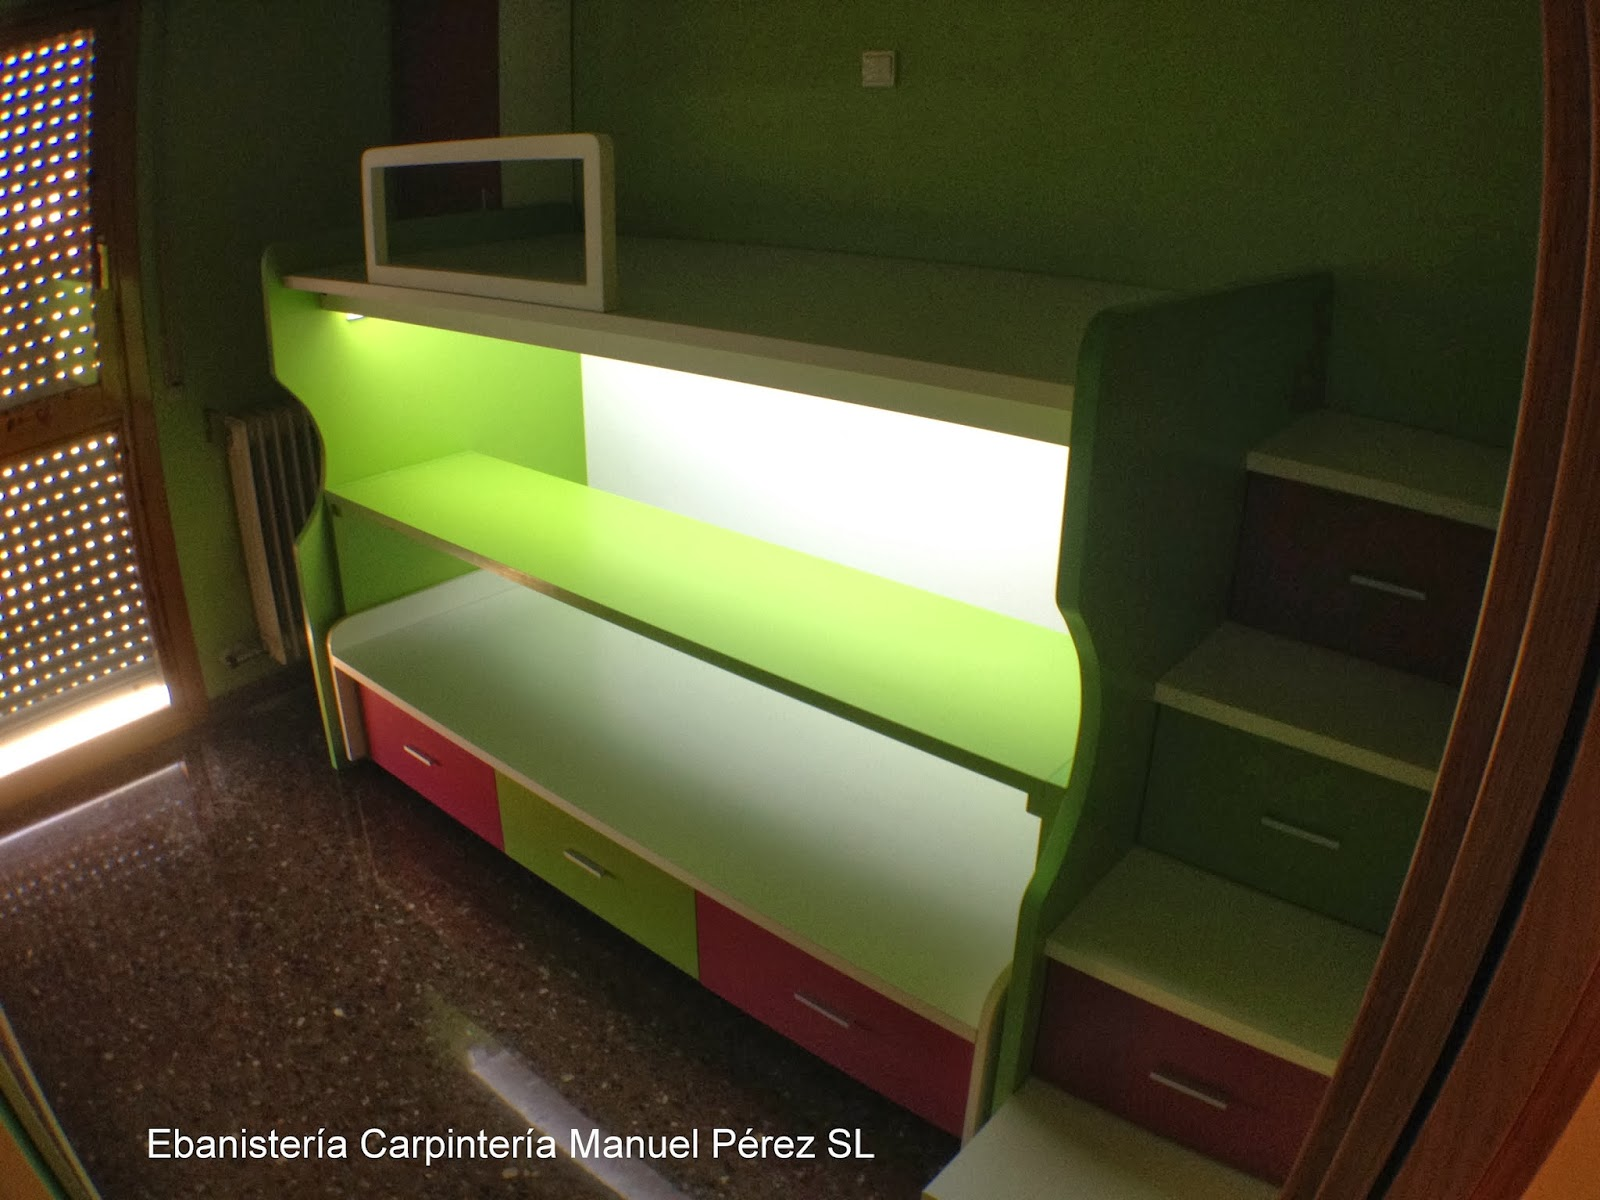 Ebanisteria carpinteria manuel perez zaragoza cama - Literas con escaleras de cajones ...